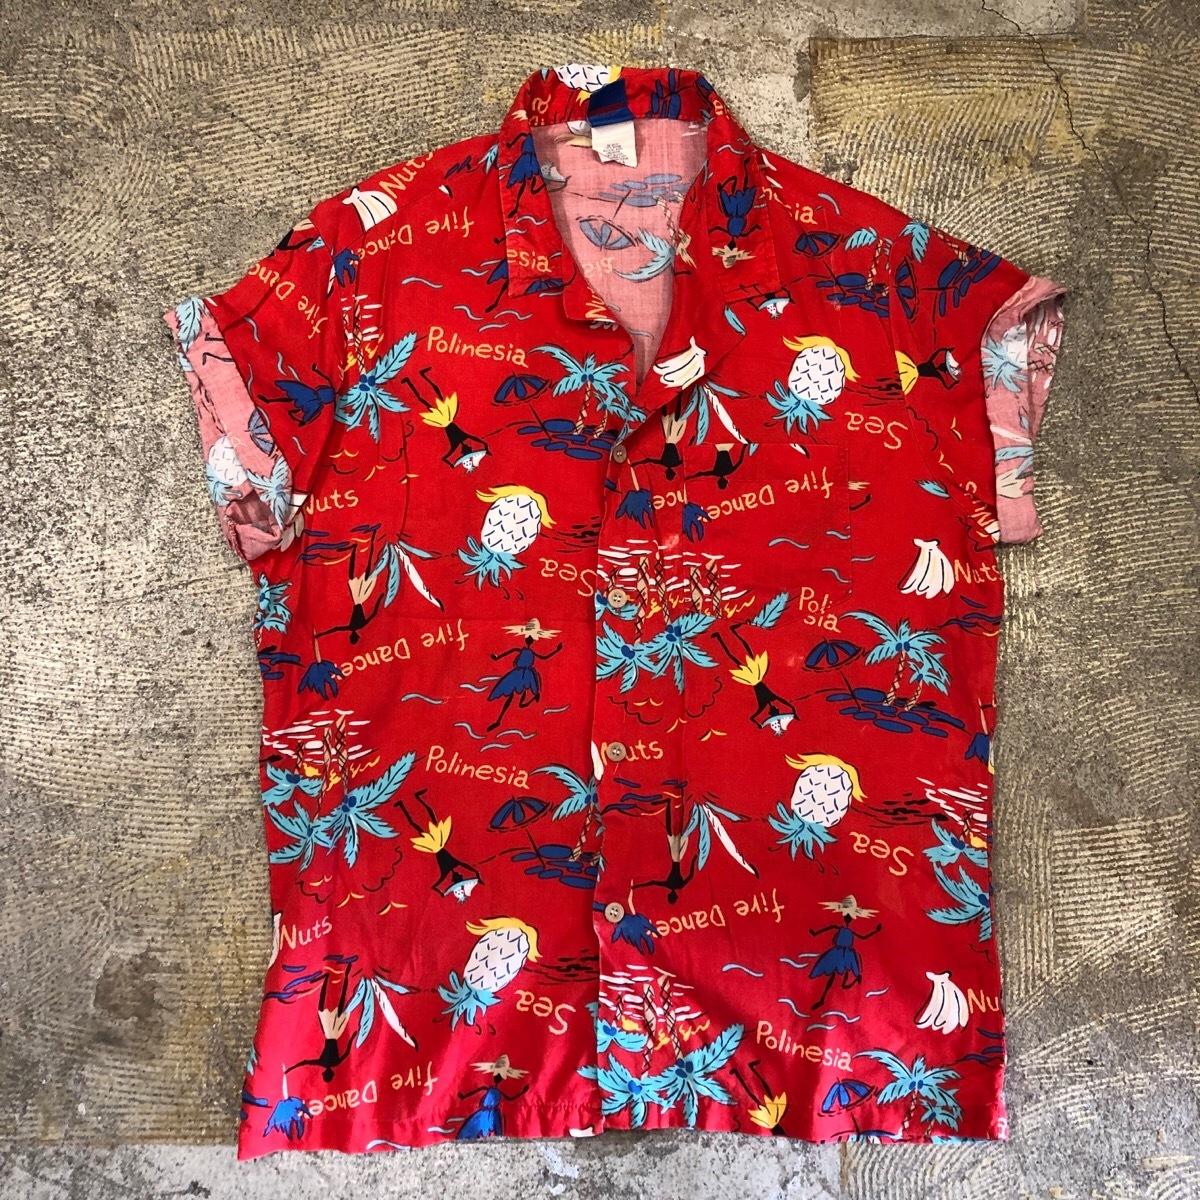 Ocean Pacific 80's Aloha Shirts ¥5,200+tax